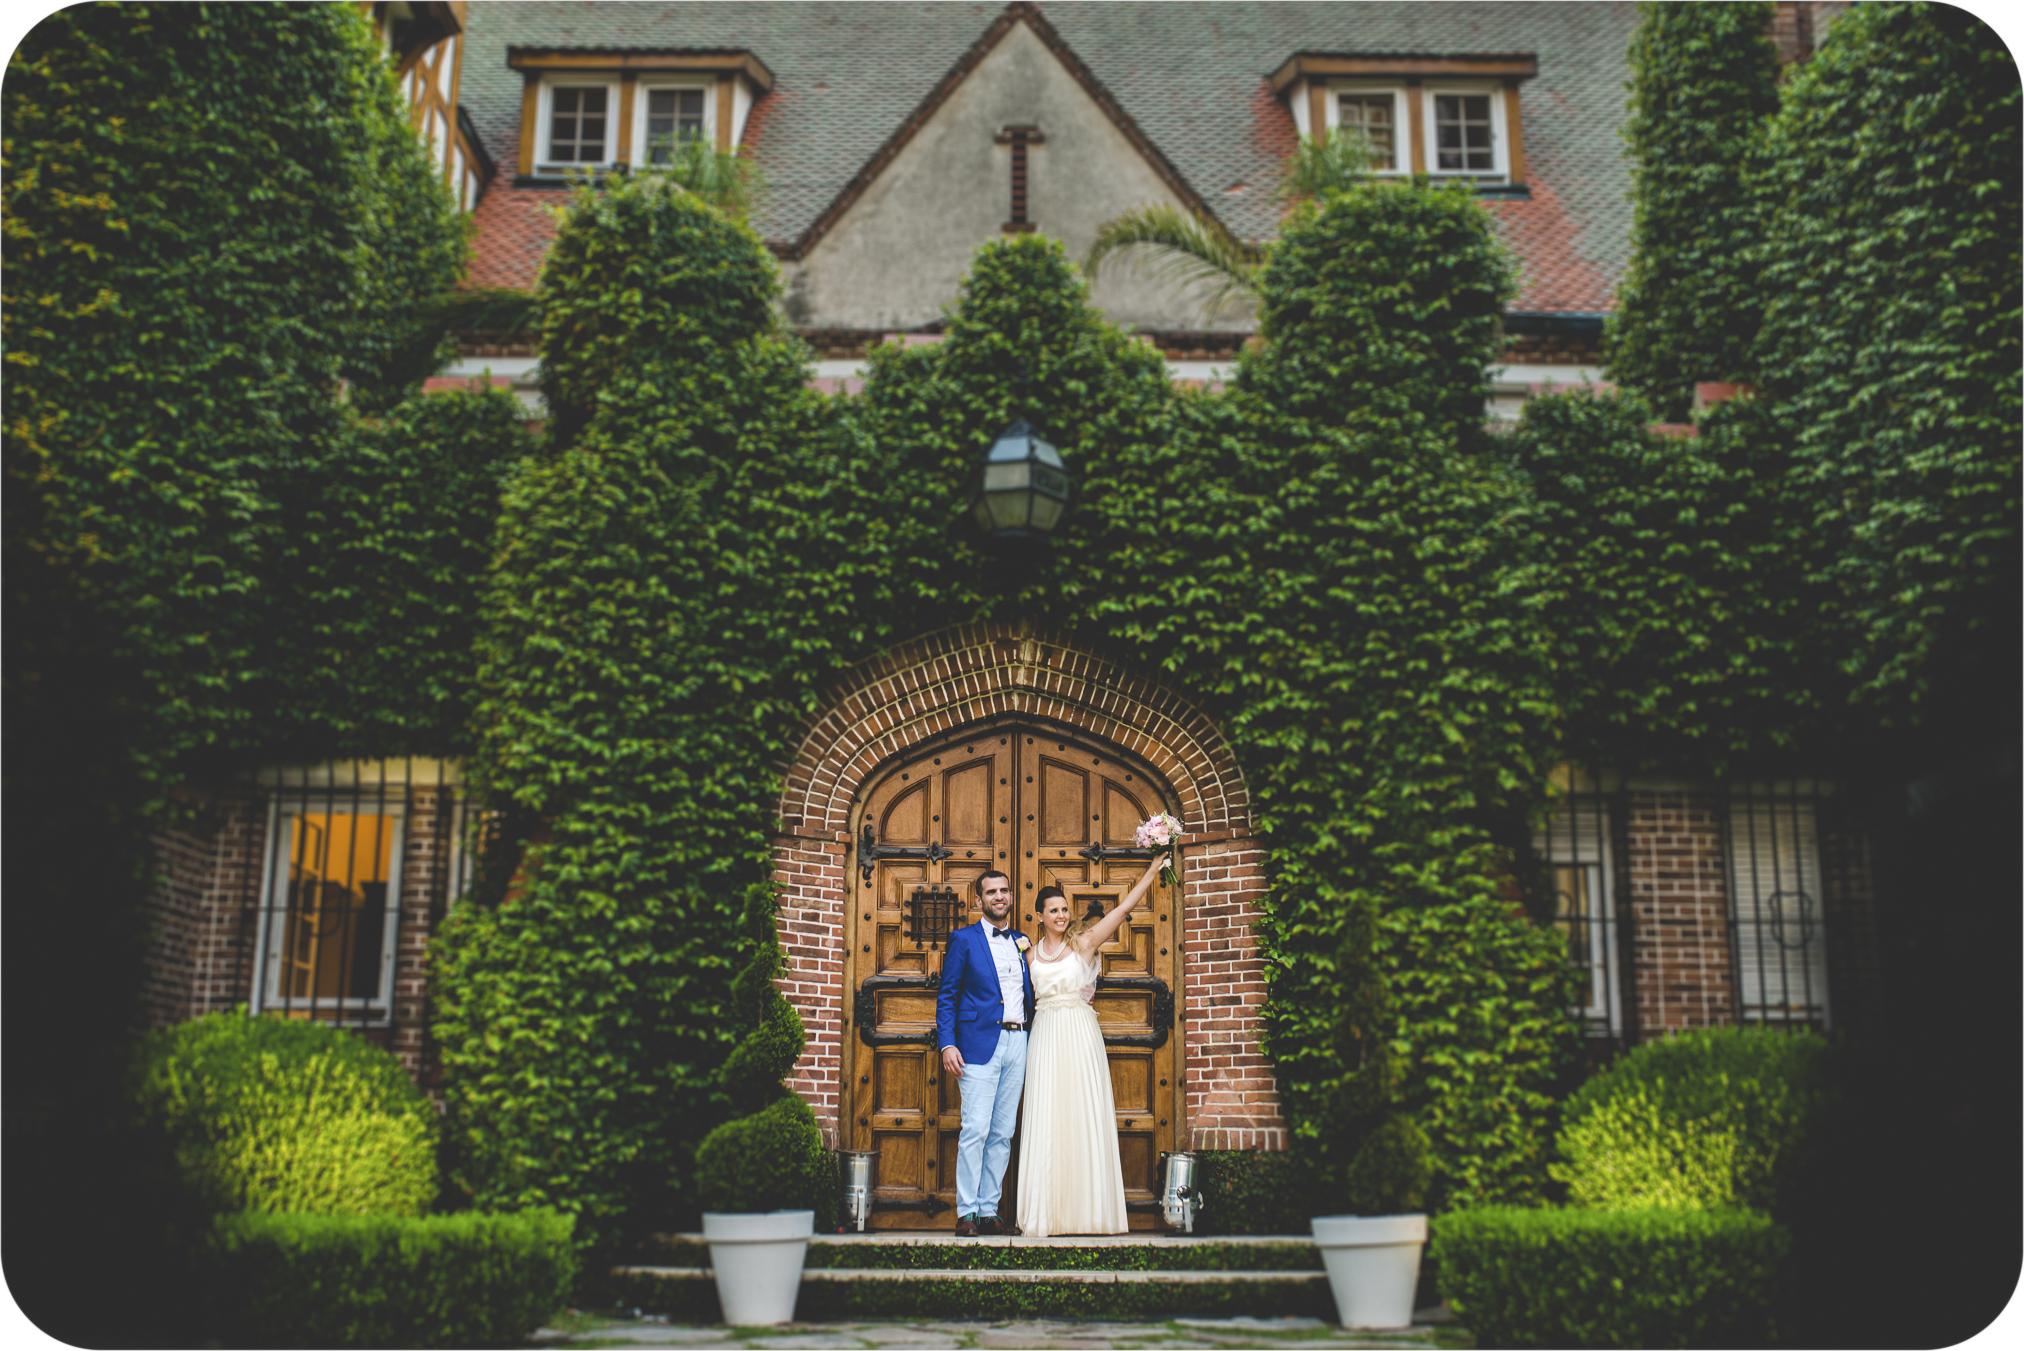 Fotógrafo de bodas profesional | Maxi Oviedo